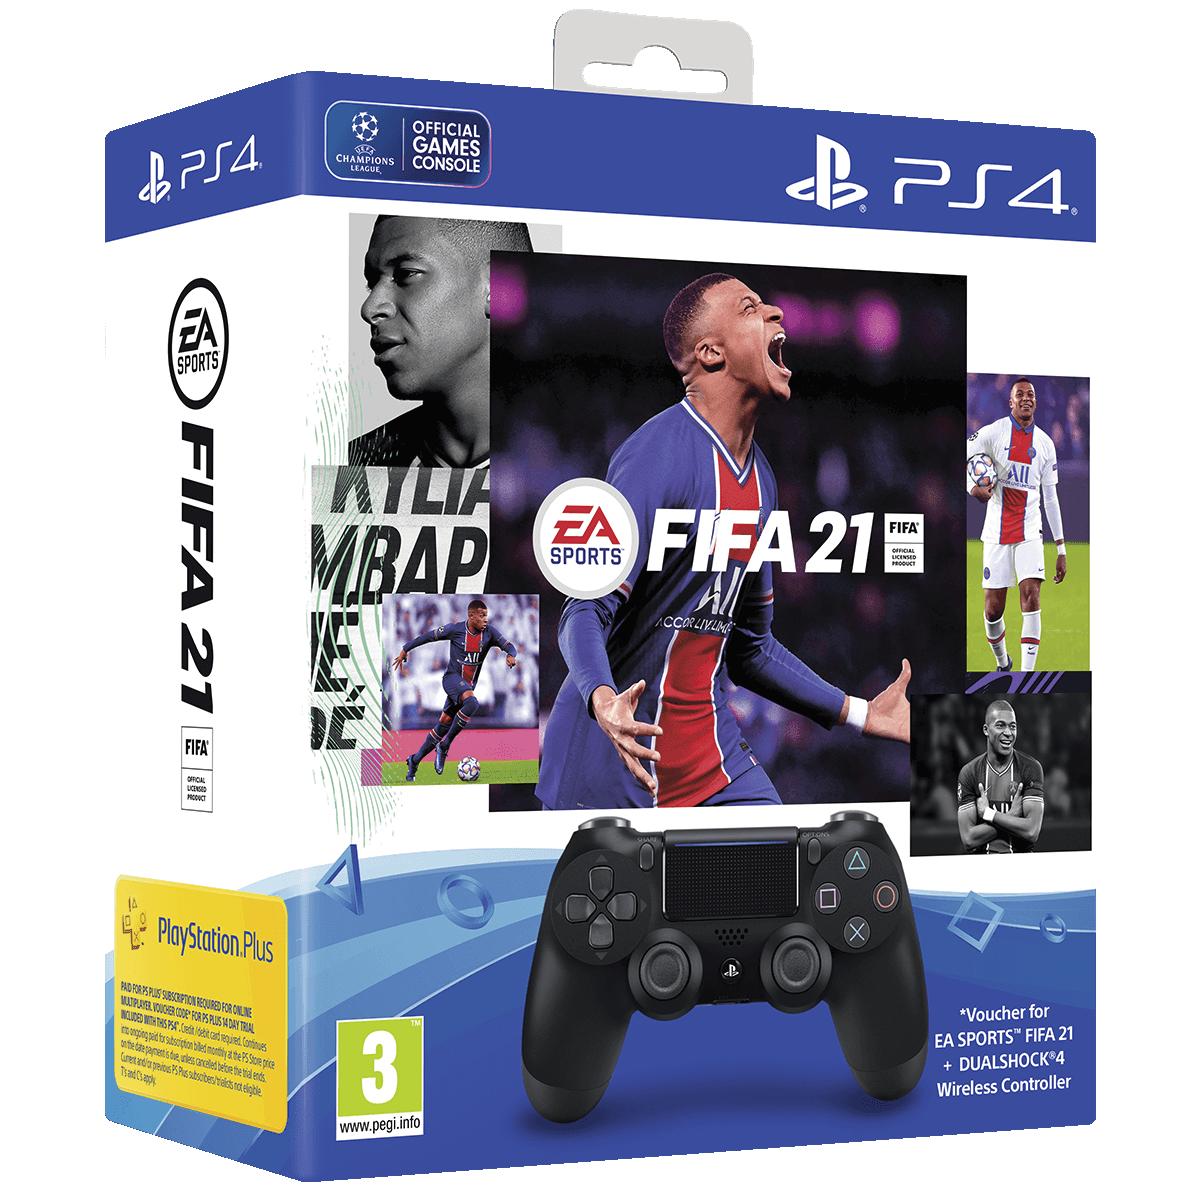 FIFA 21 DS4-Paketbild